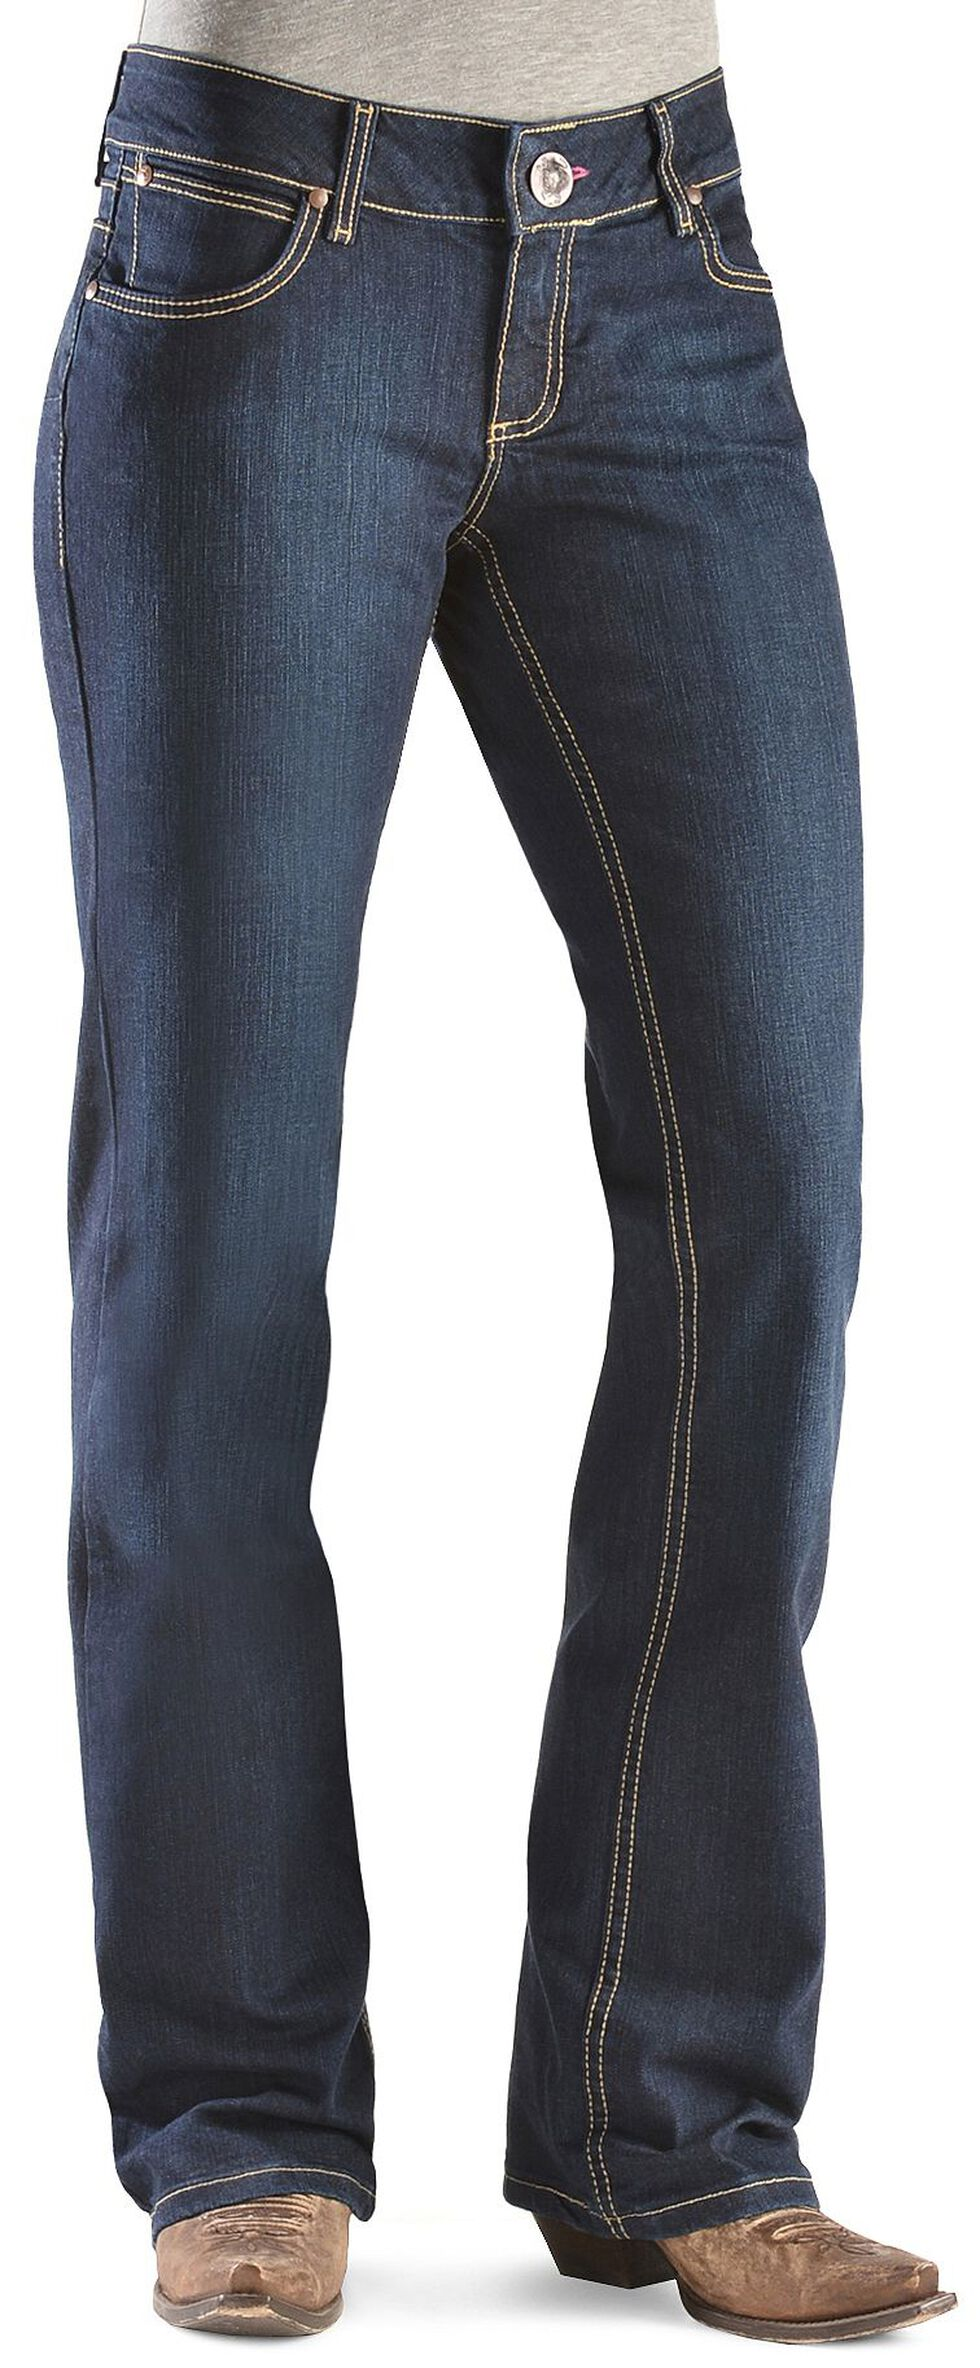 Wrangler Women's Dark Rinse Retro Mae Booty Up Jeans, Denim, hi-res